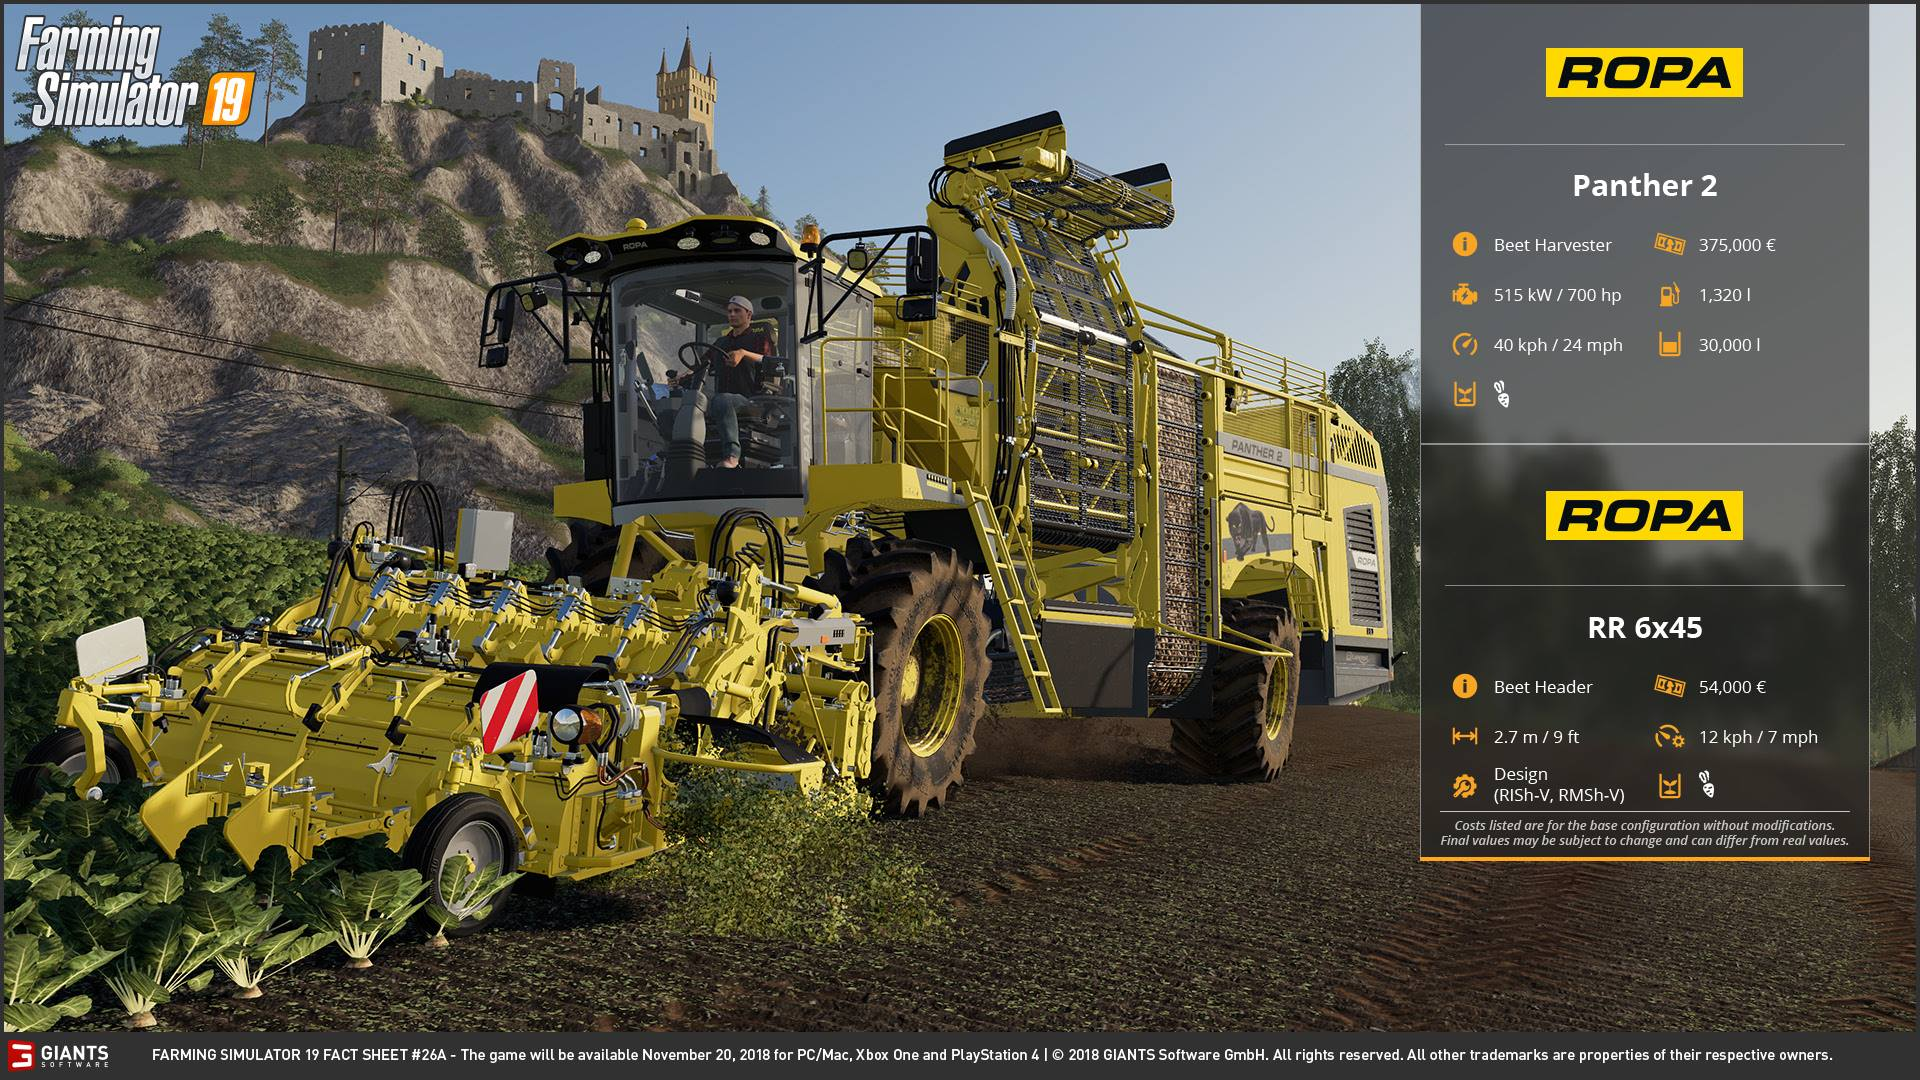 John Deere Combines And More Vehicles In Farming Simulator